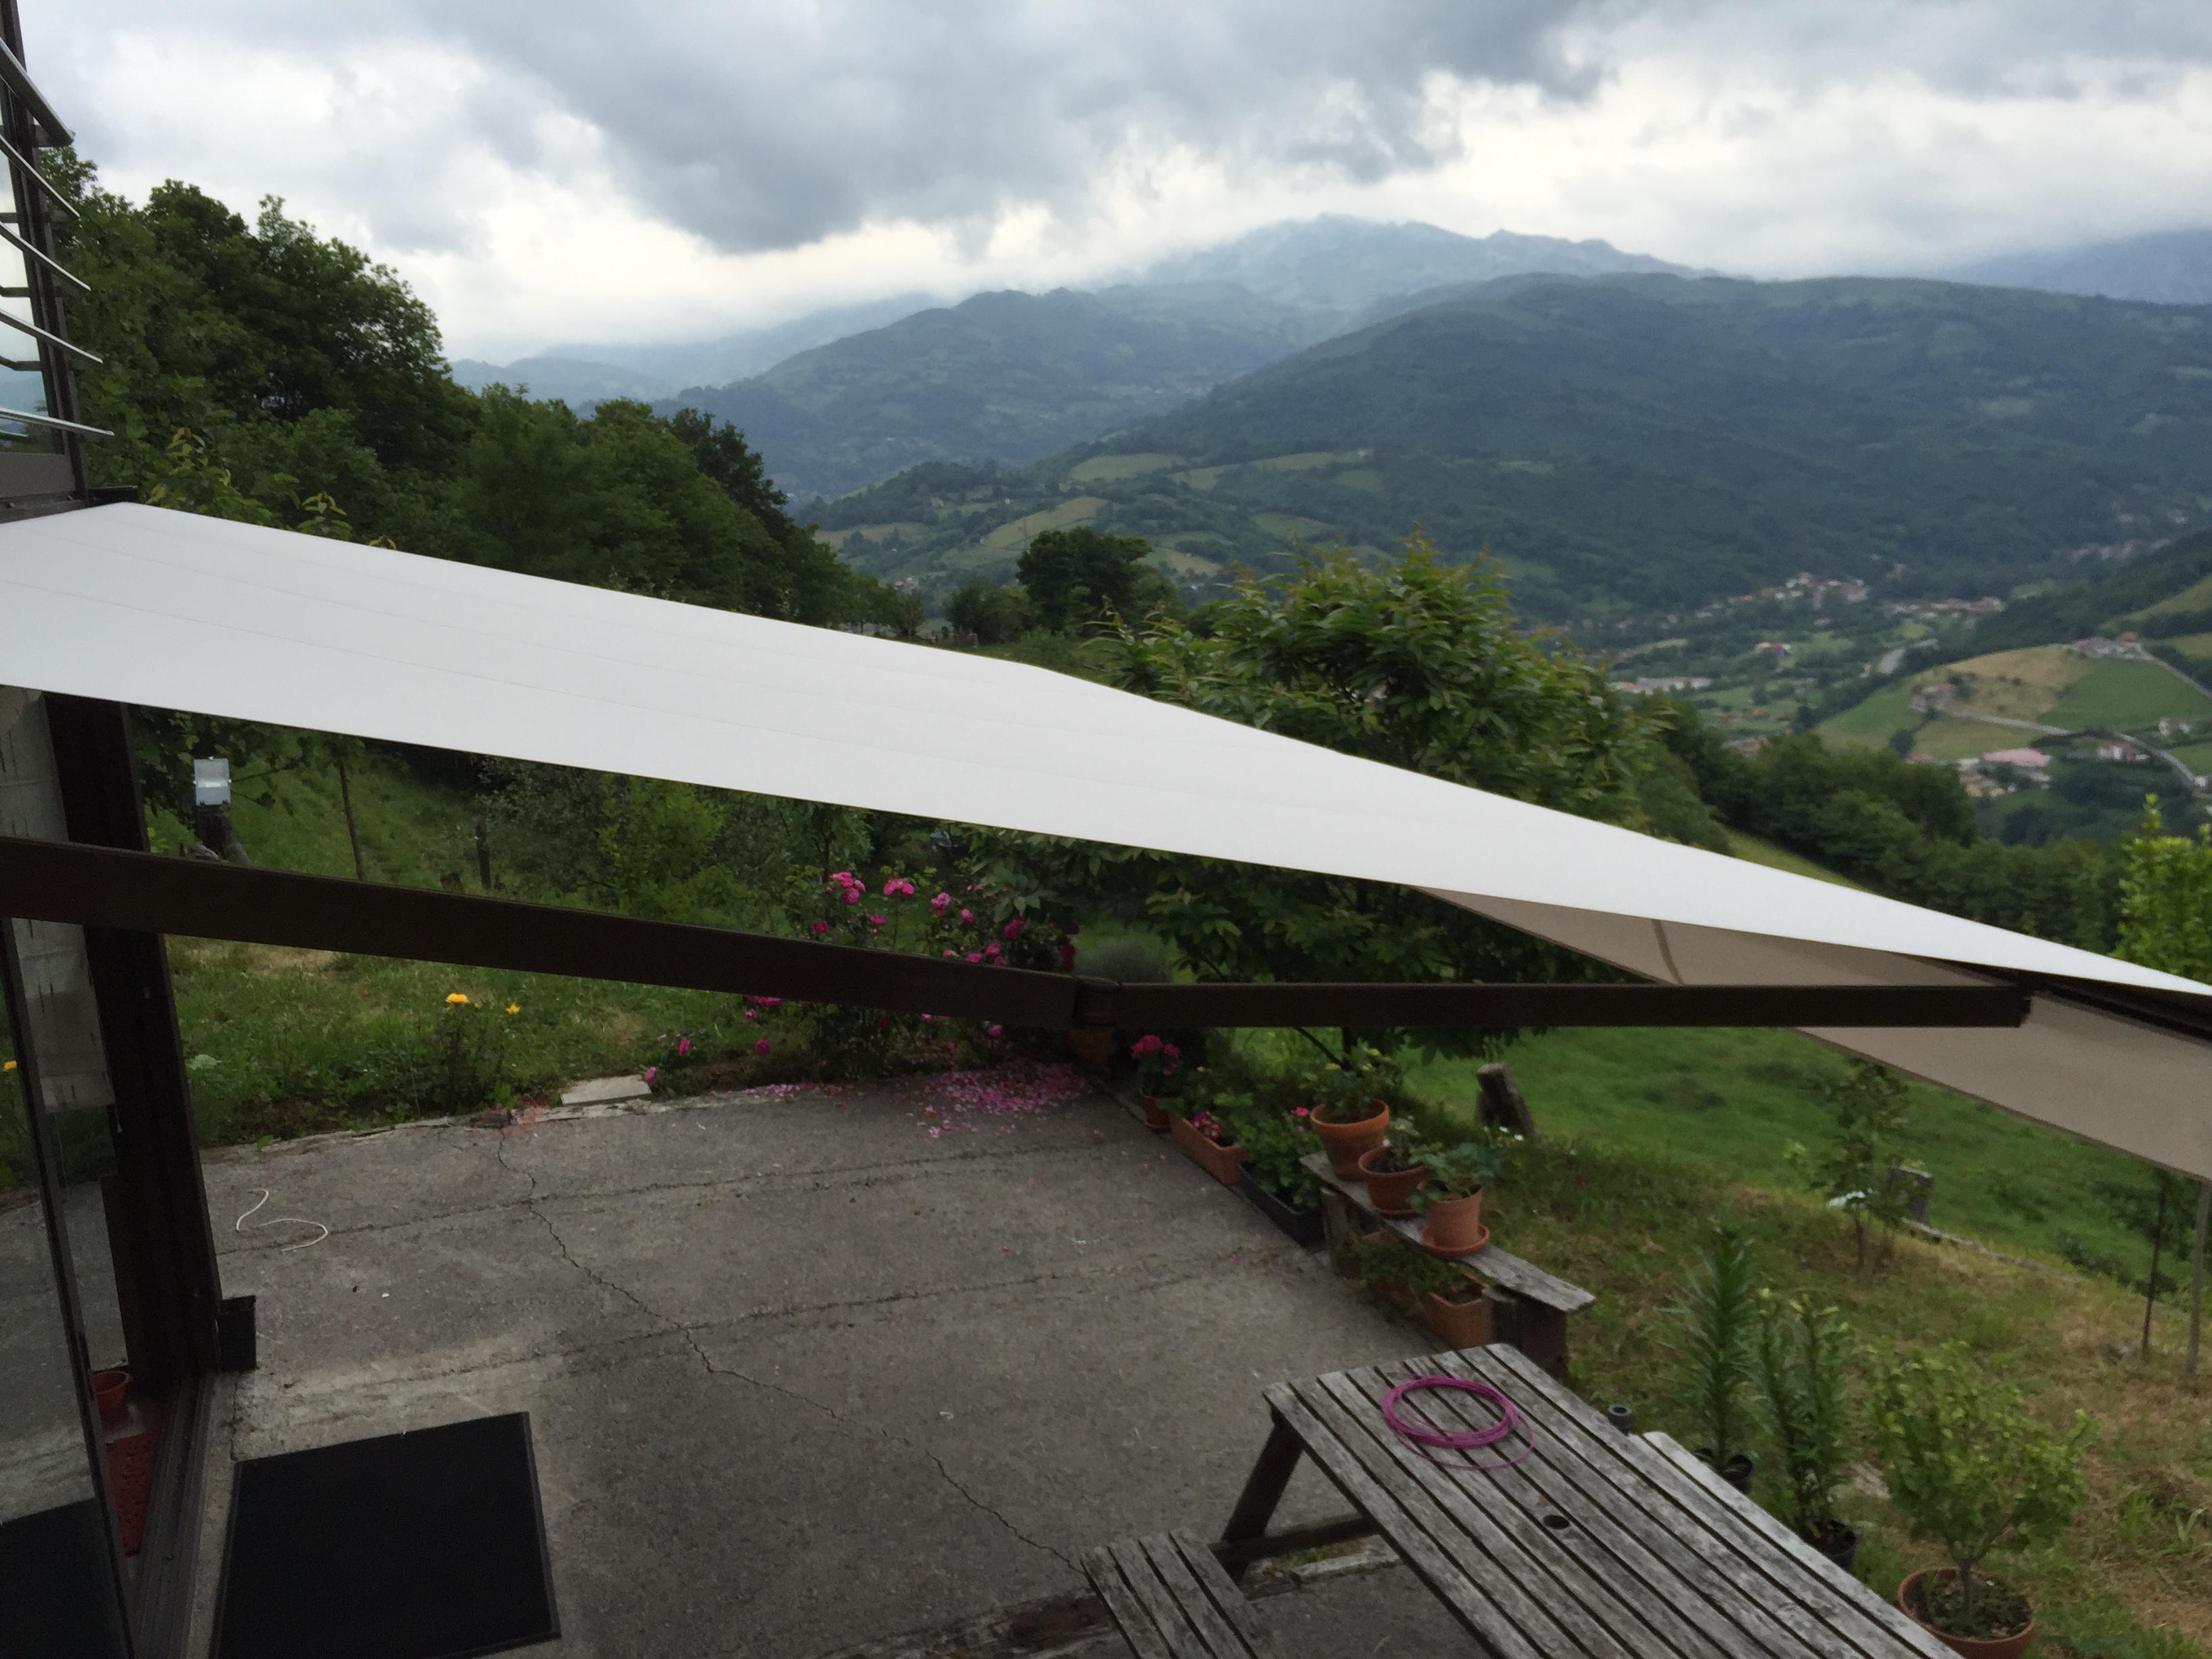 Solinext toldos para terraza asturias laviana for Fabrica de brazos invisibles para toldos